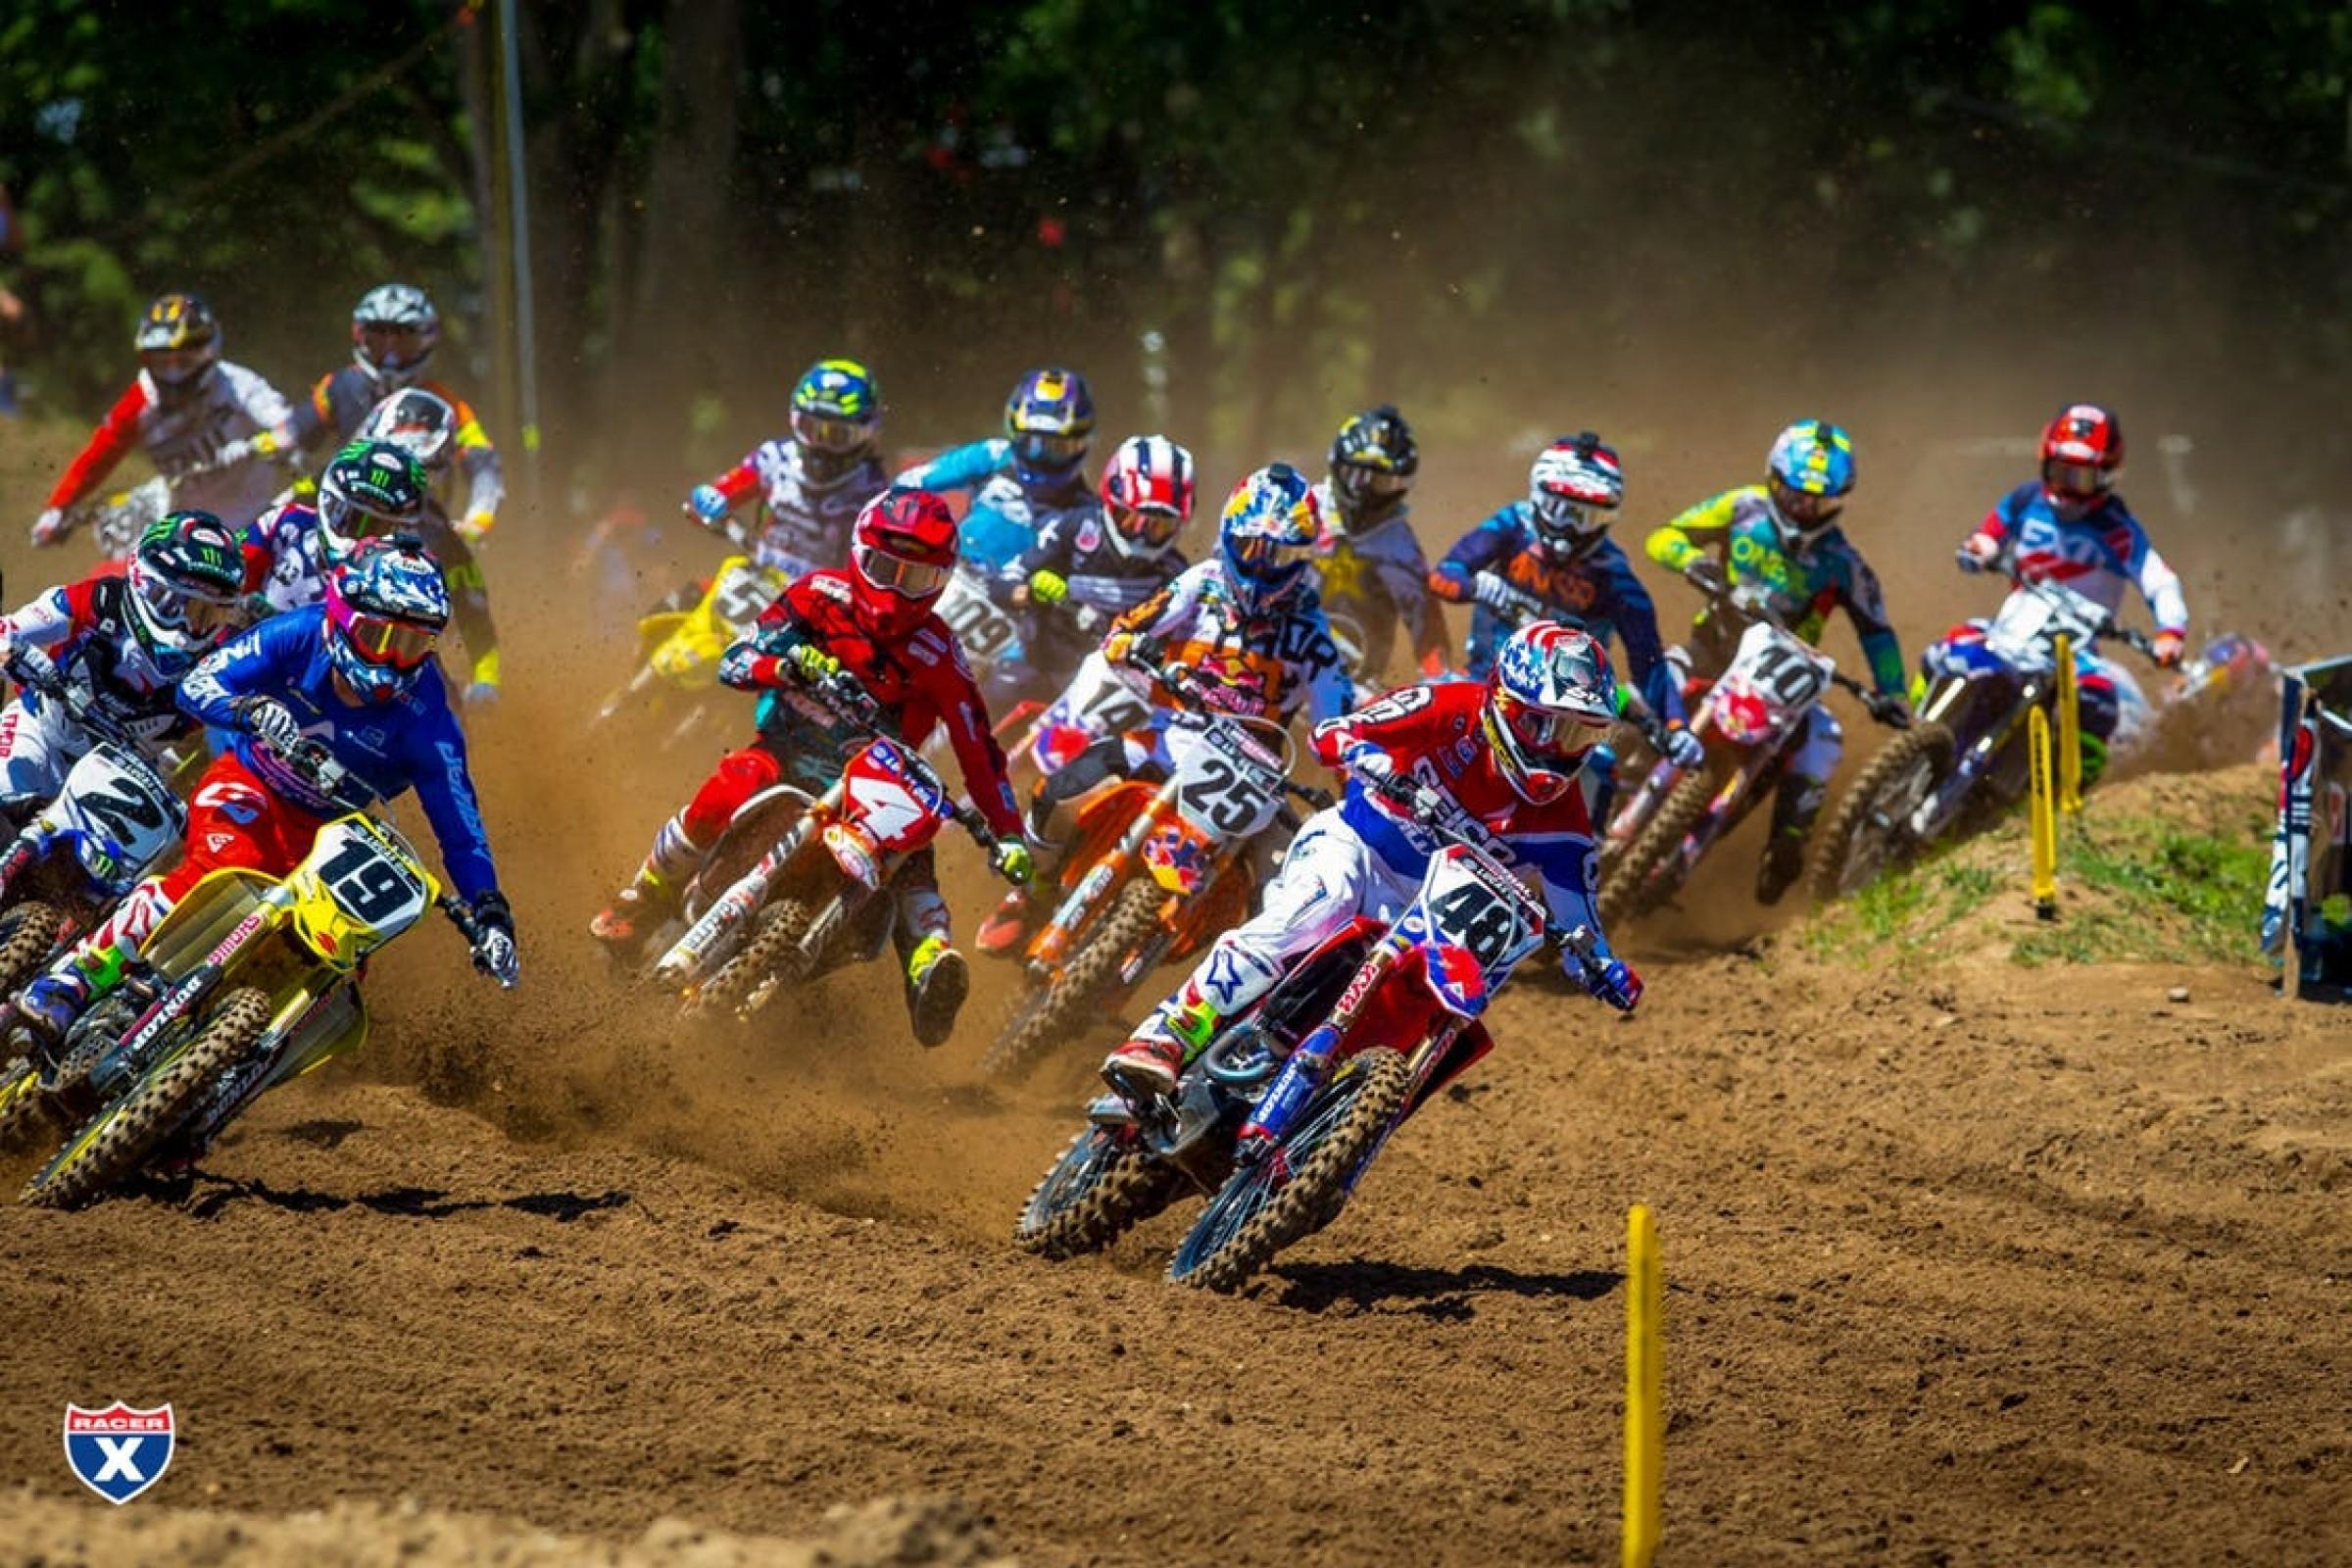 2018 Lucas Oil Pro Motocross Championship Schedule Announced - Racer X Online